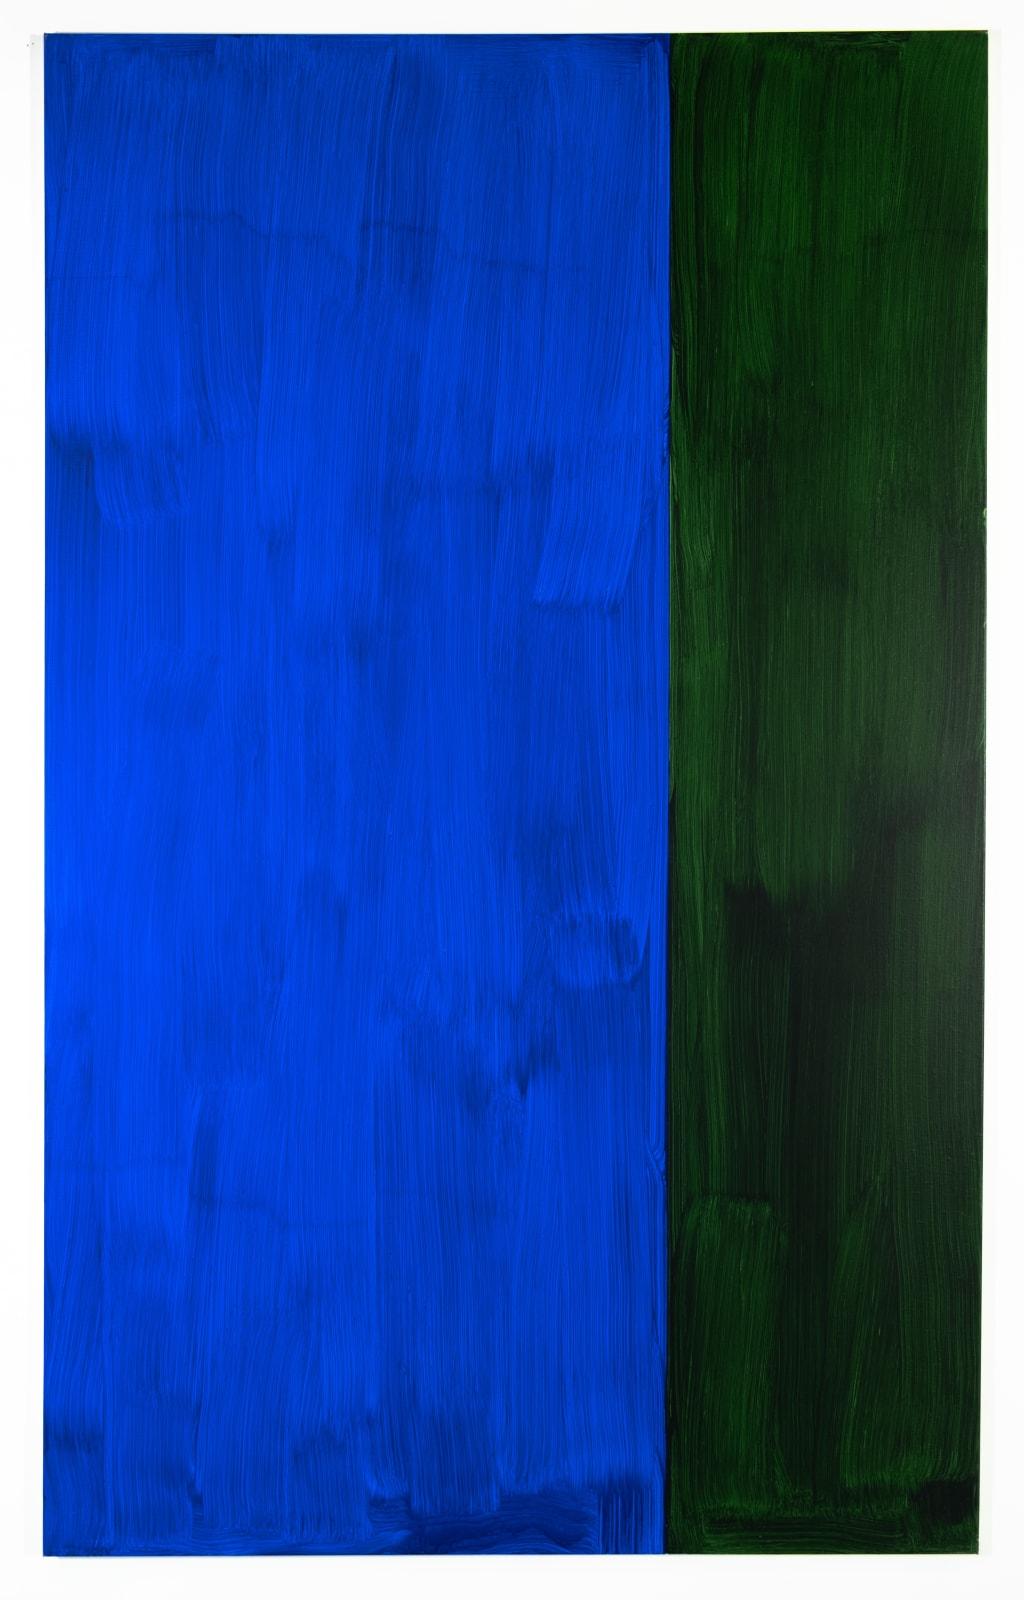 'Untitled'《無題》, 1990